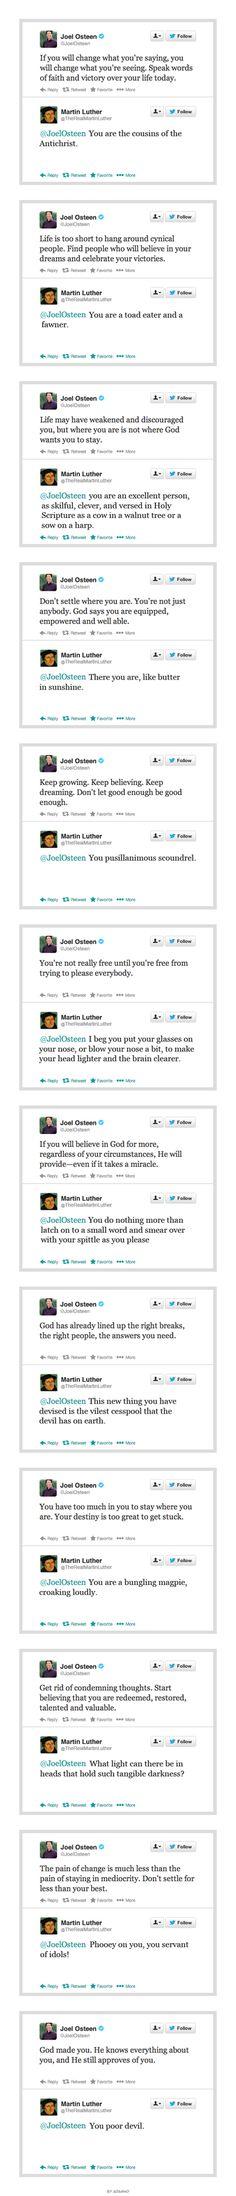 Martin Luther replies to Joel osteen's tweets // hahahaha